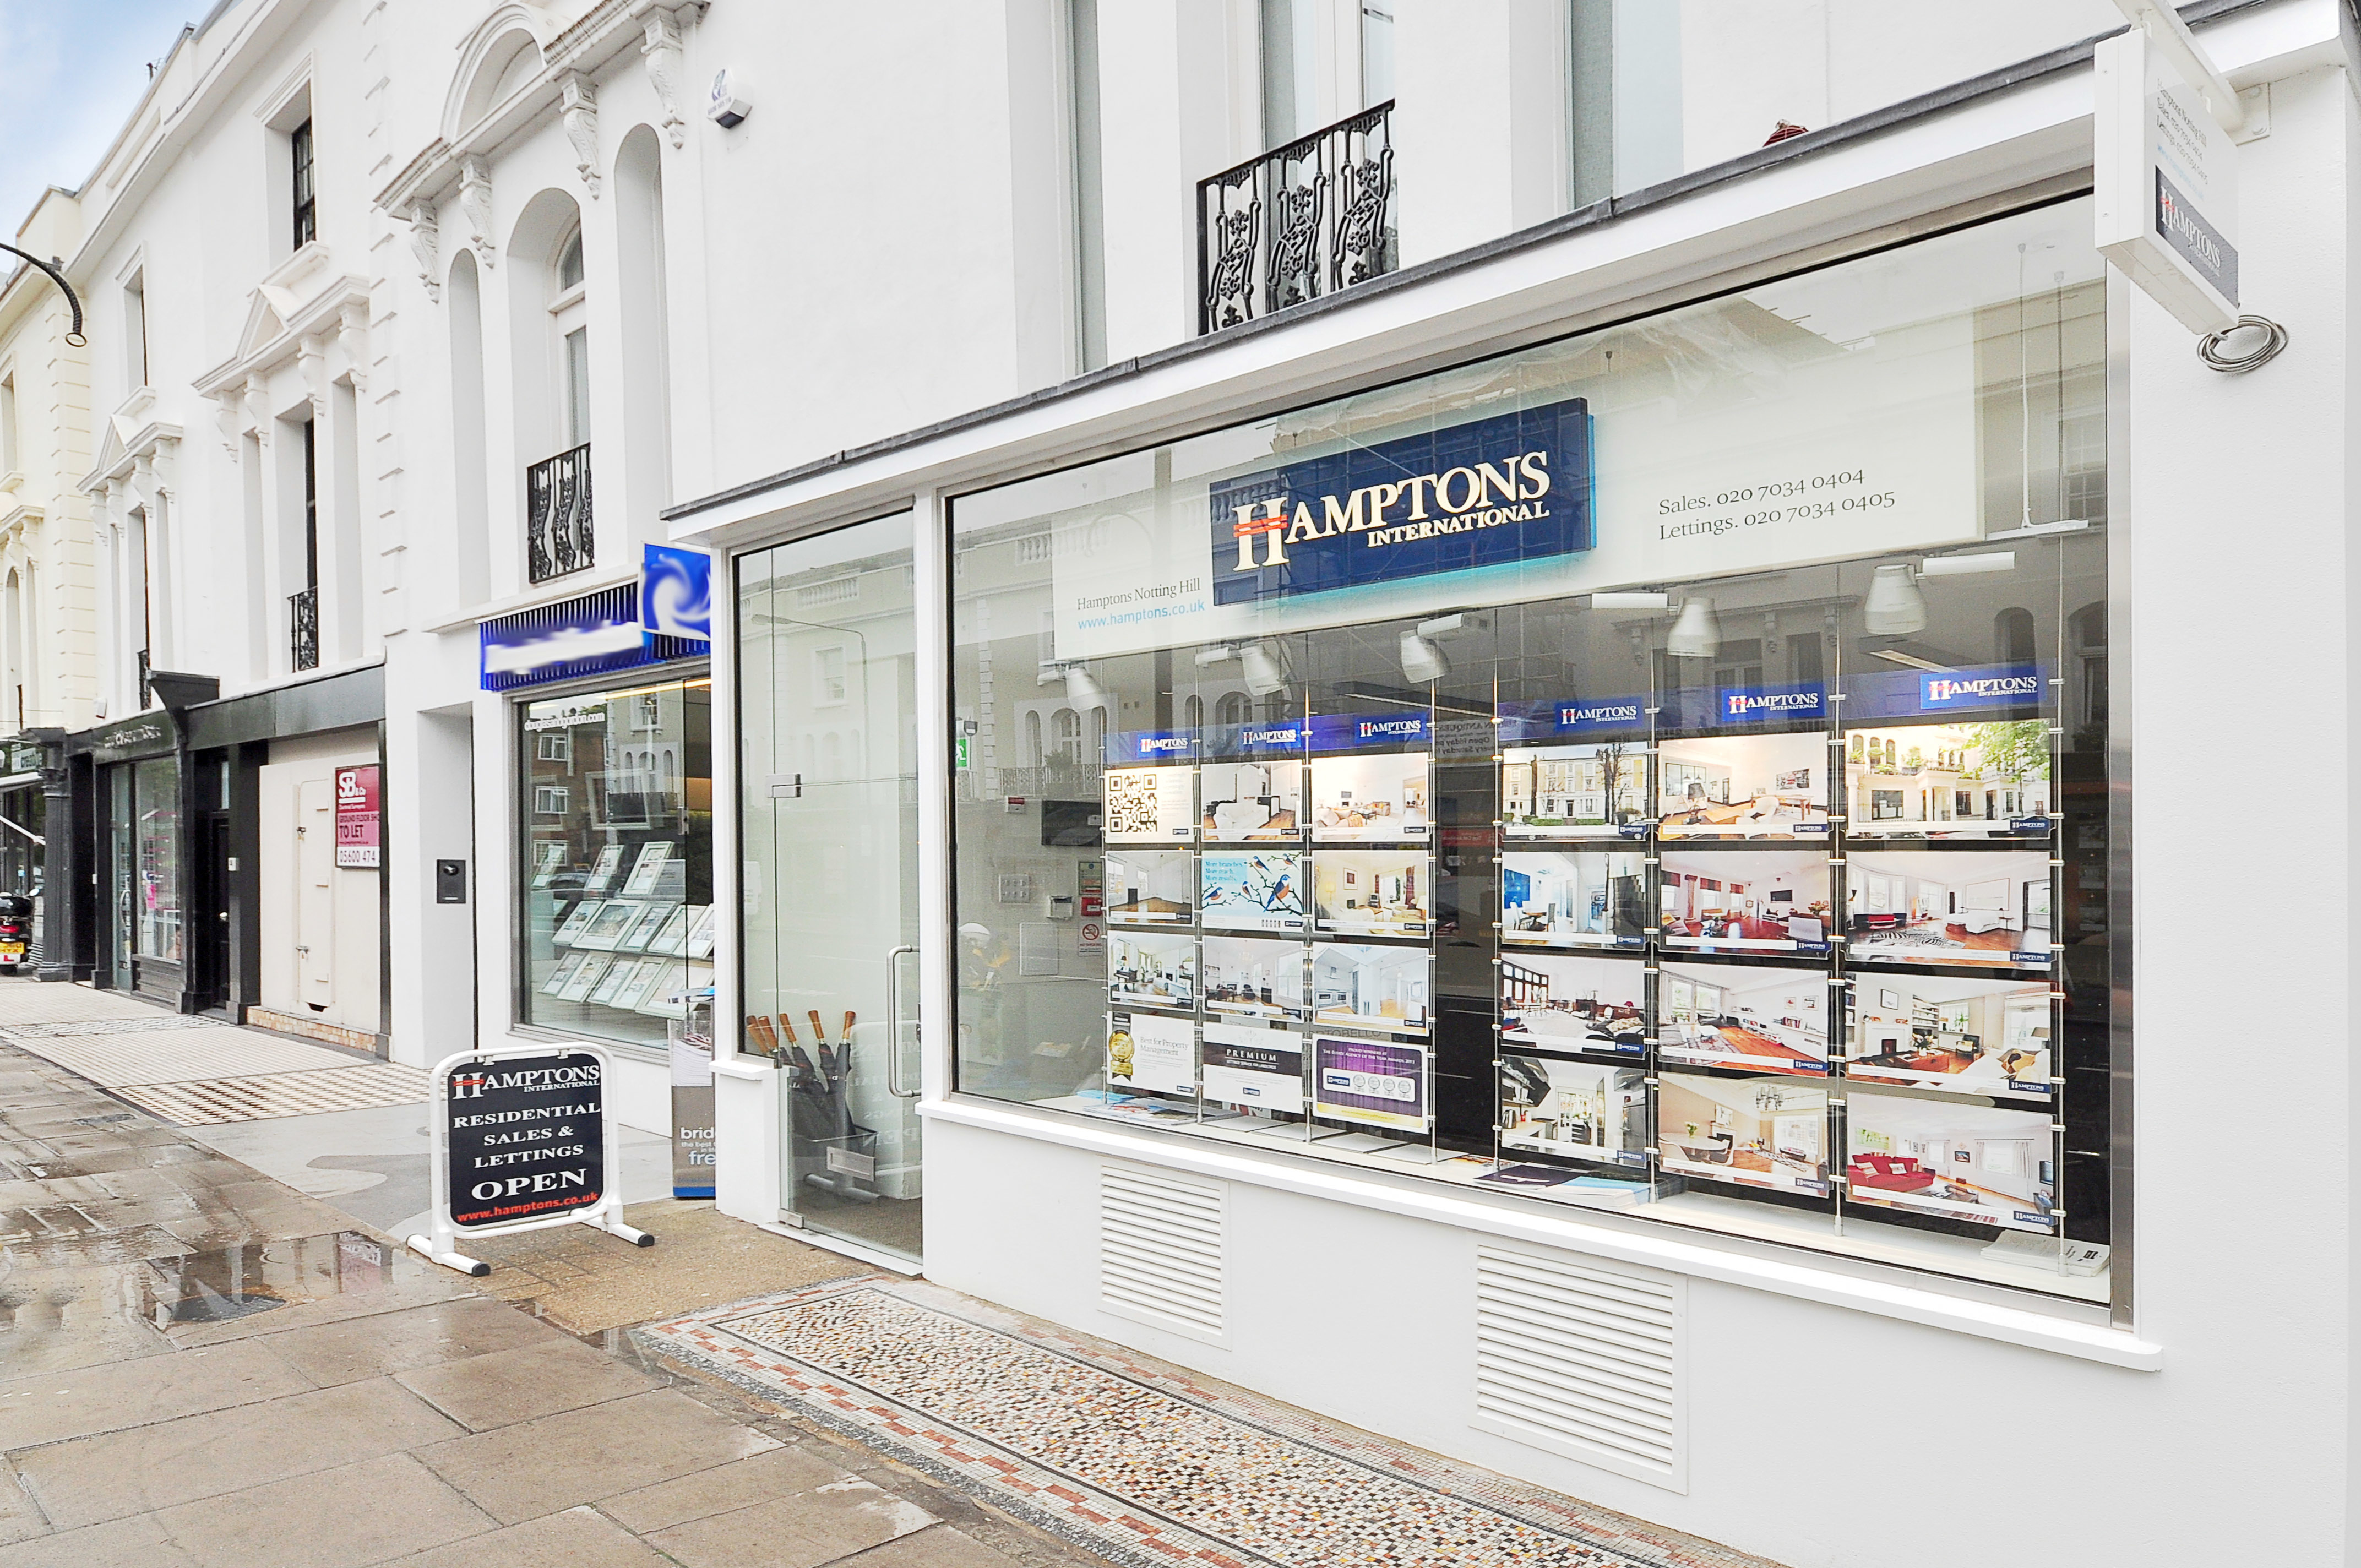 Hamptons International Estate Agents Notting Hill